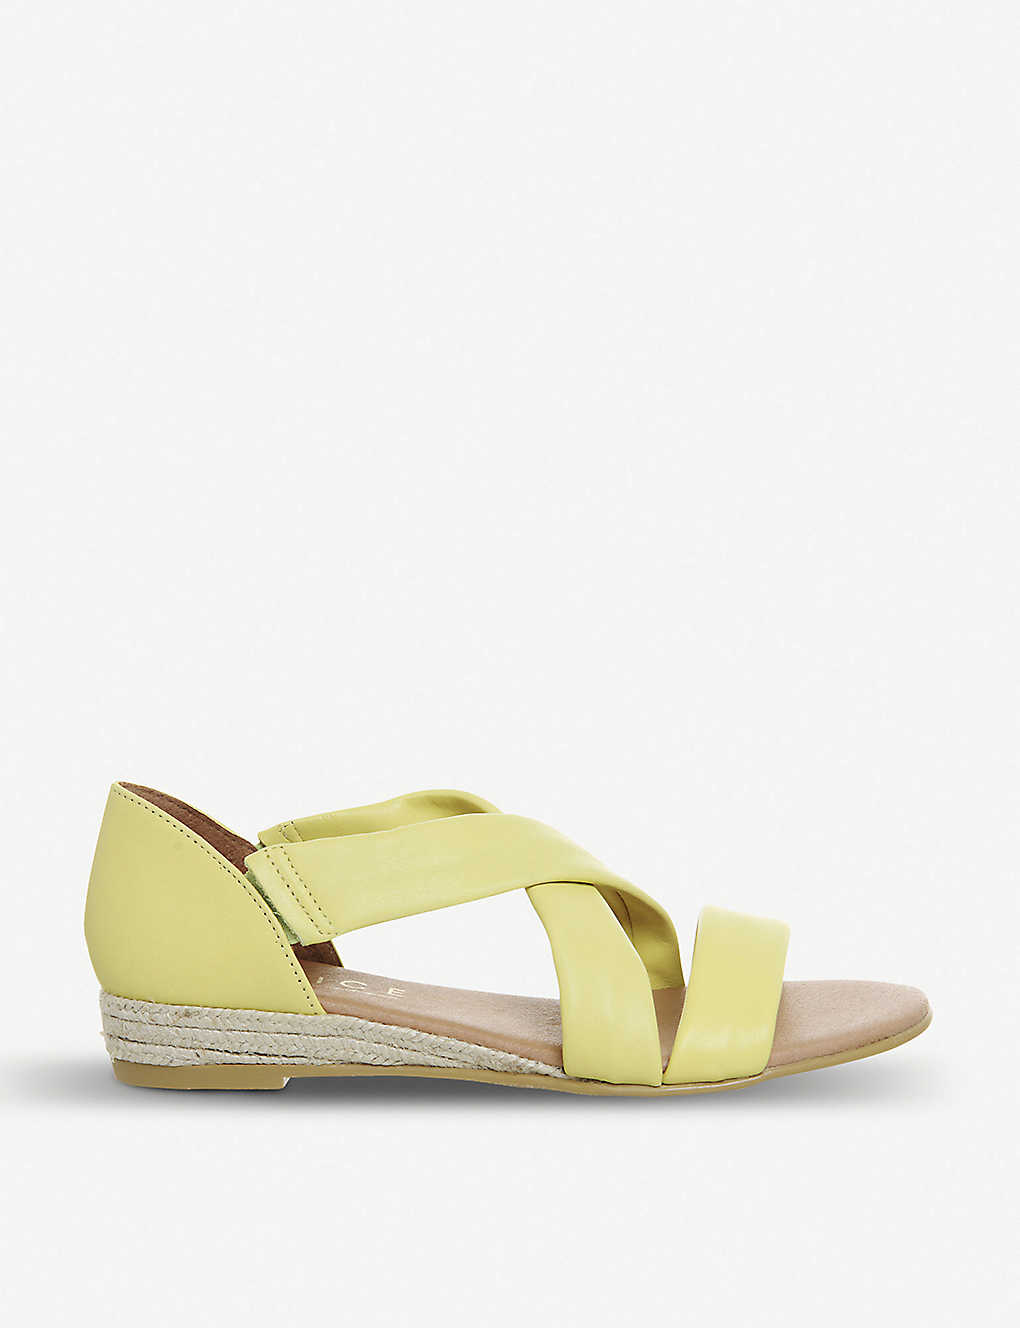 c6db0b4dbca9 OFFICE - Hallie cross-over strap espadrille leather sandals ...